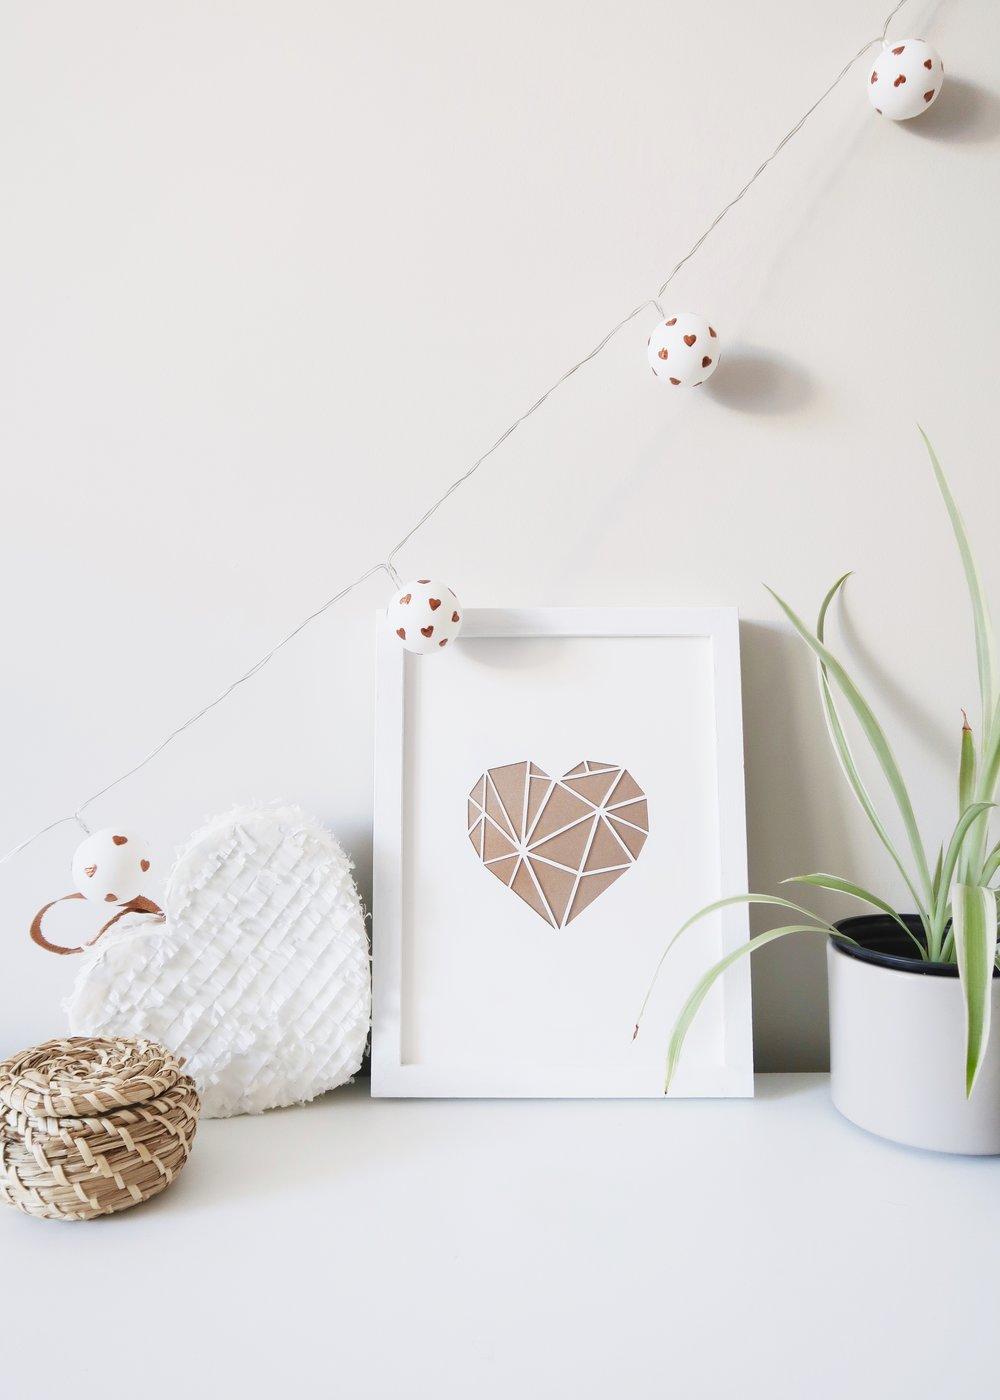 DIY Heart Print Ping Pong Lights by Isoscella